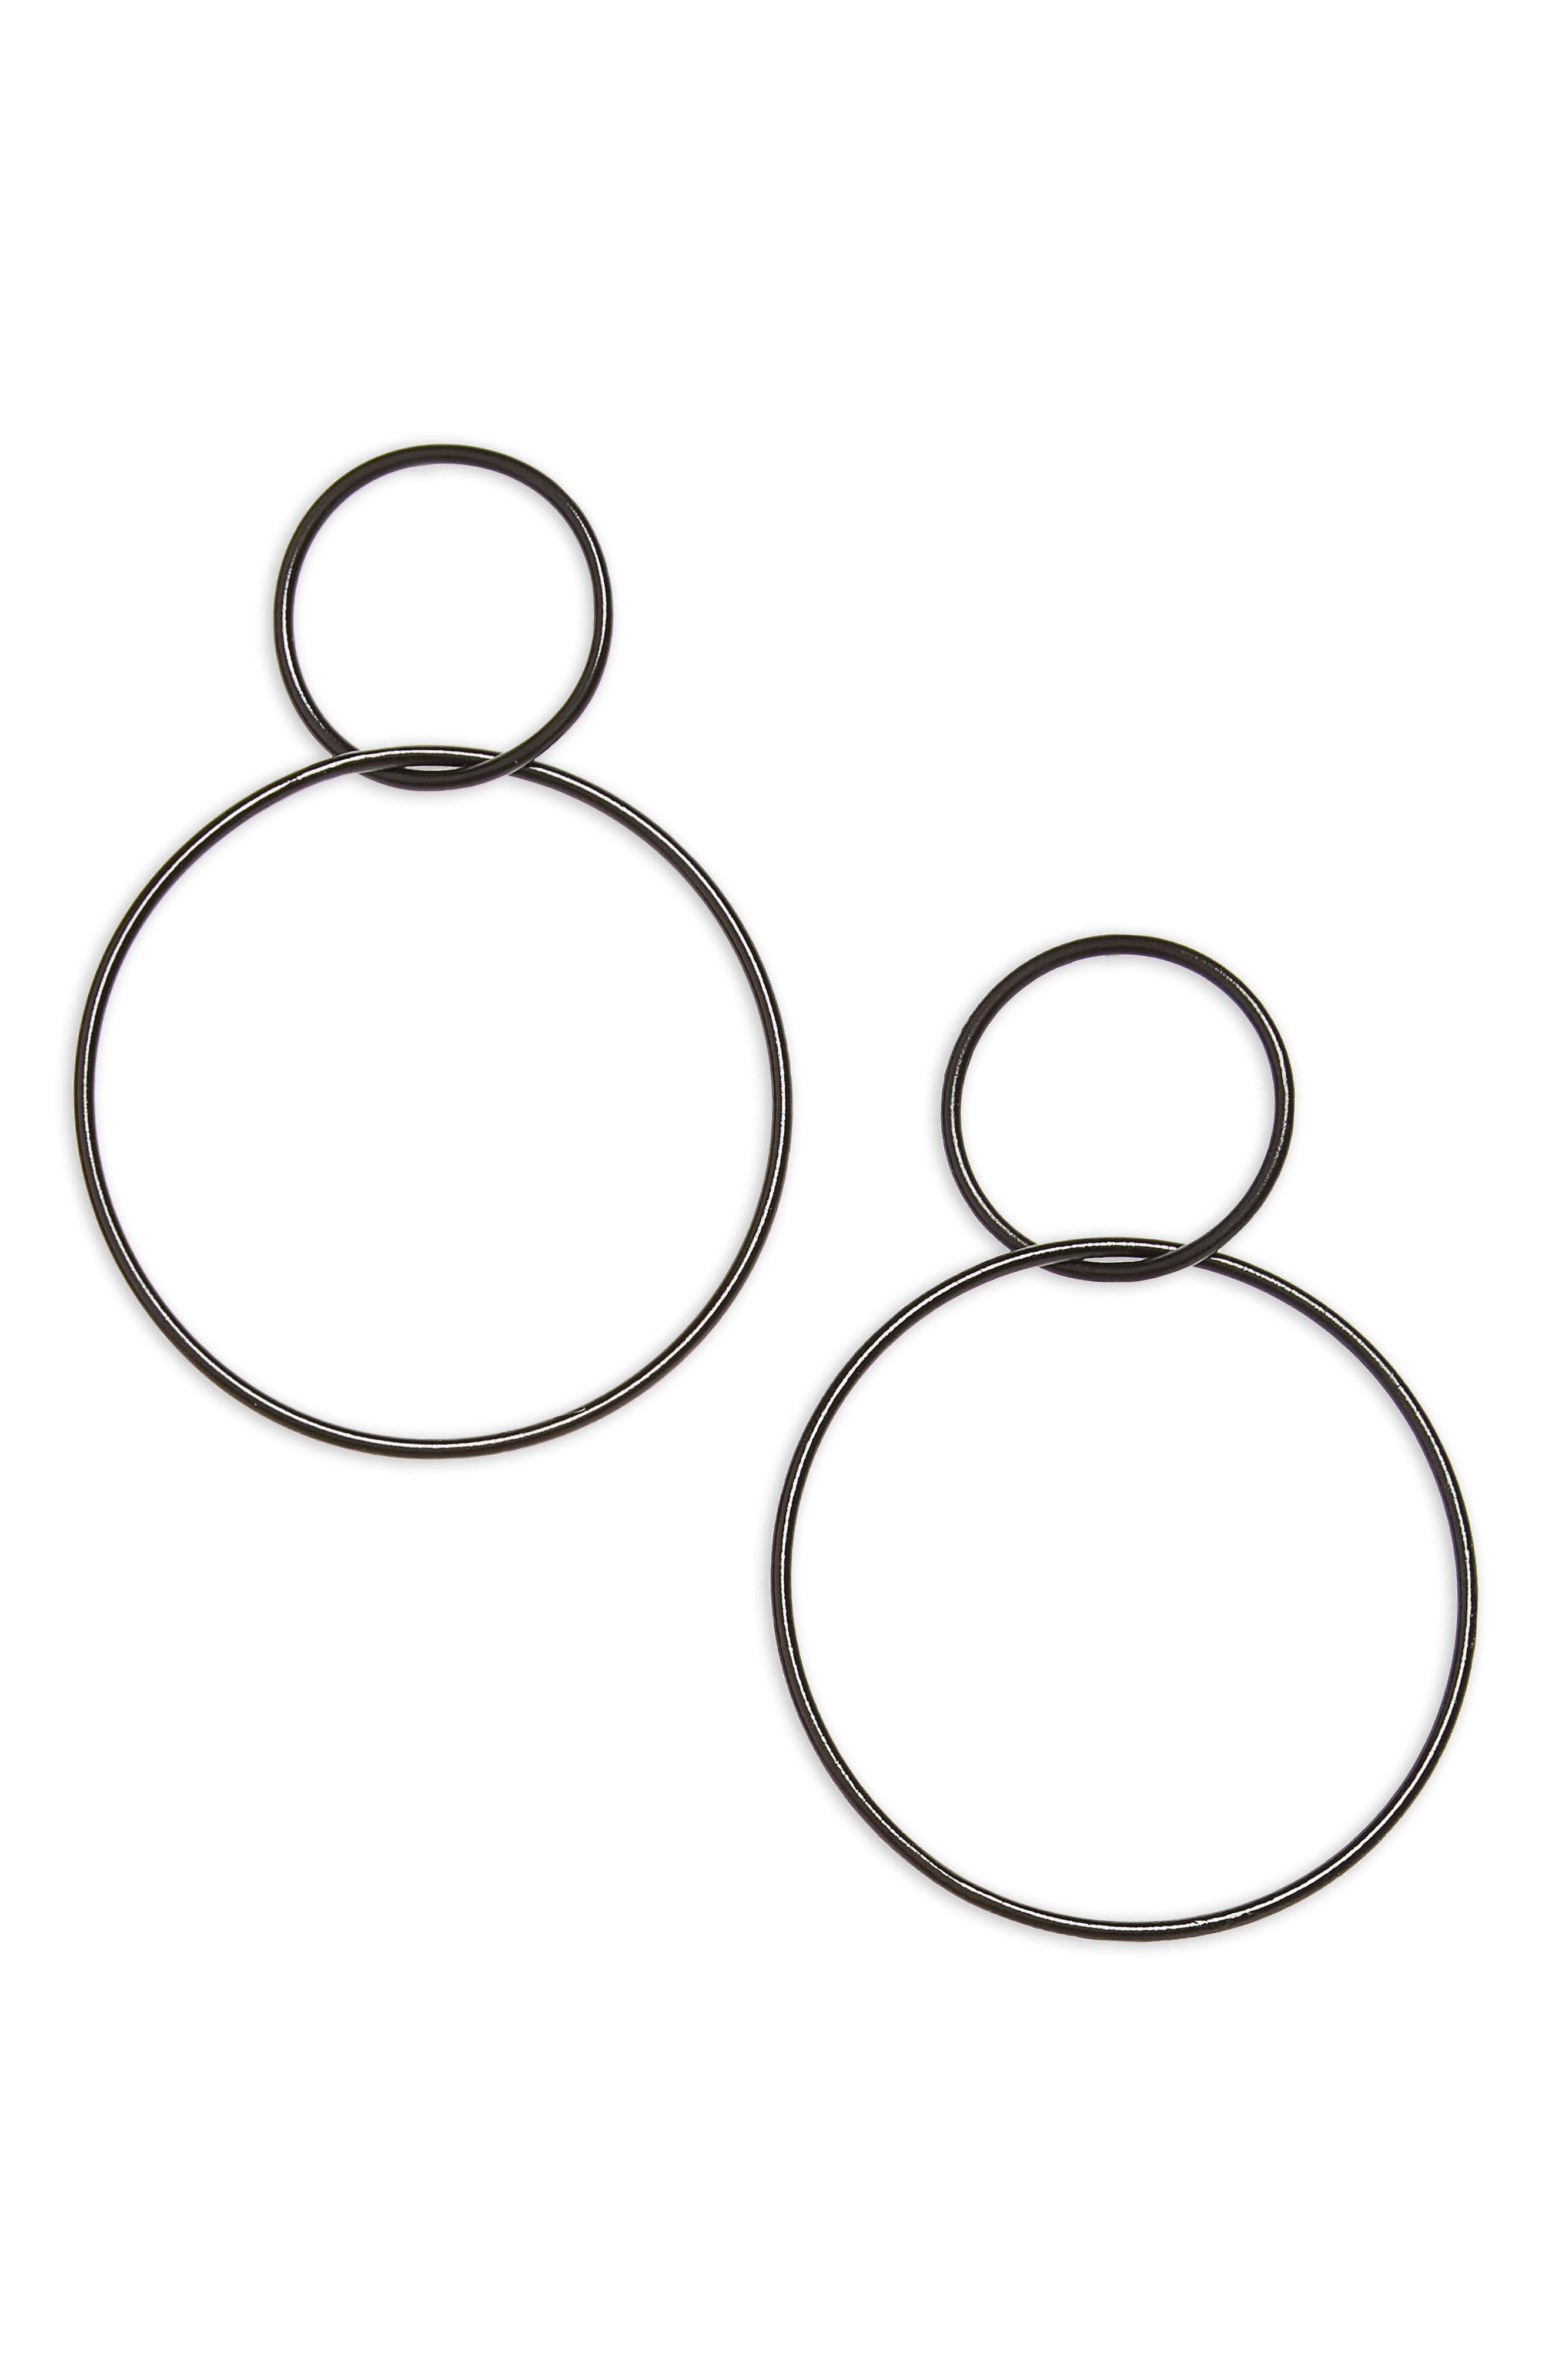 Floyd Circle Earrings,                             Main thumbnail 1, color,                             001